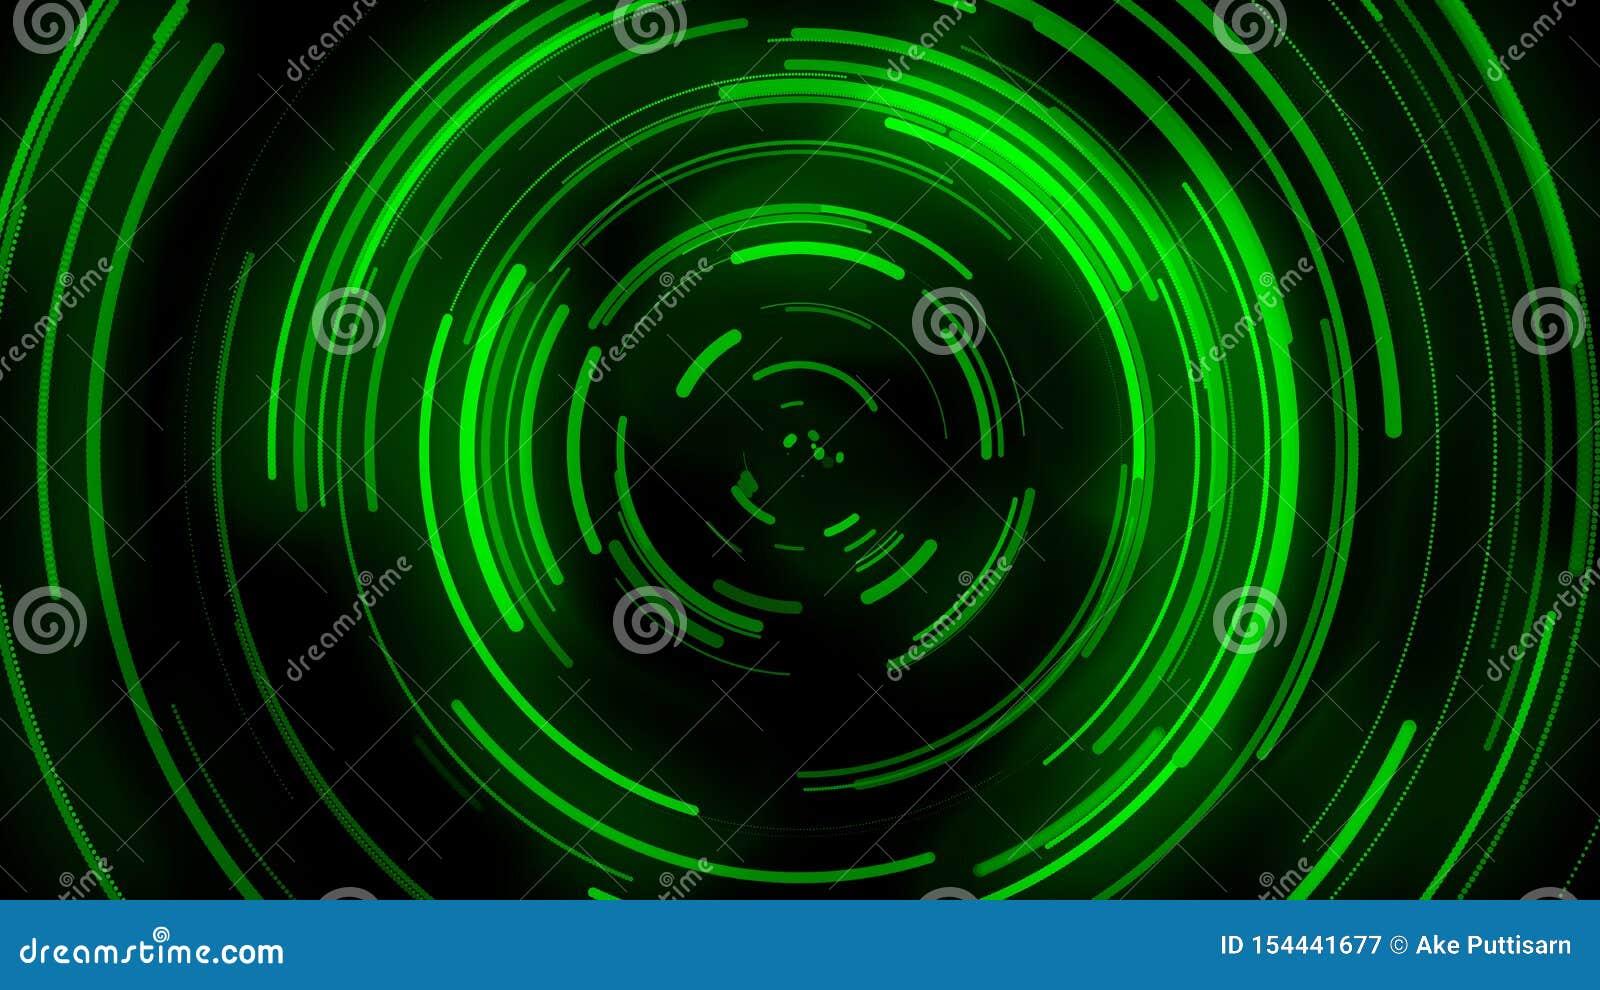 3D给背景,绿色曲线的运动赋予生命,曲线被分布,信号传输,溢出图象